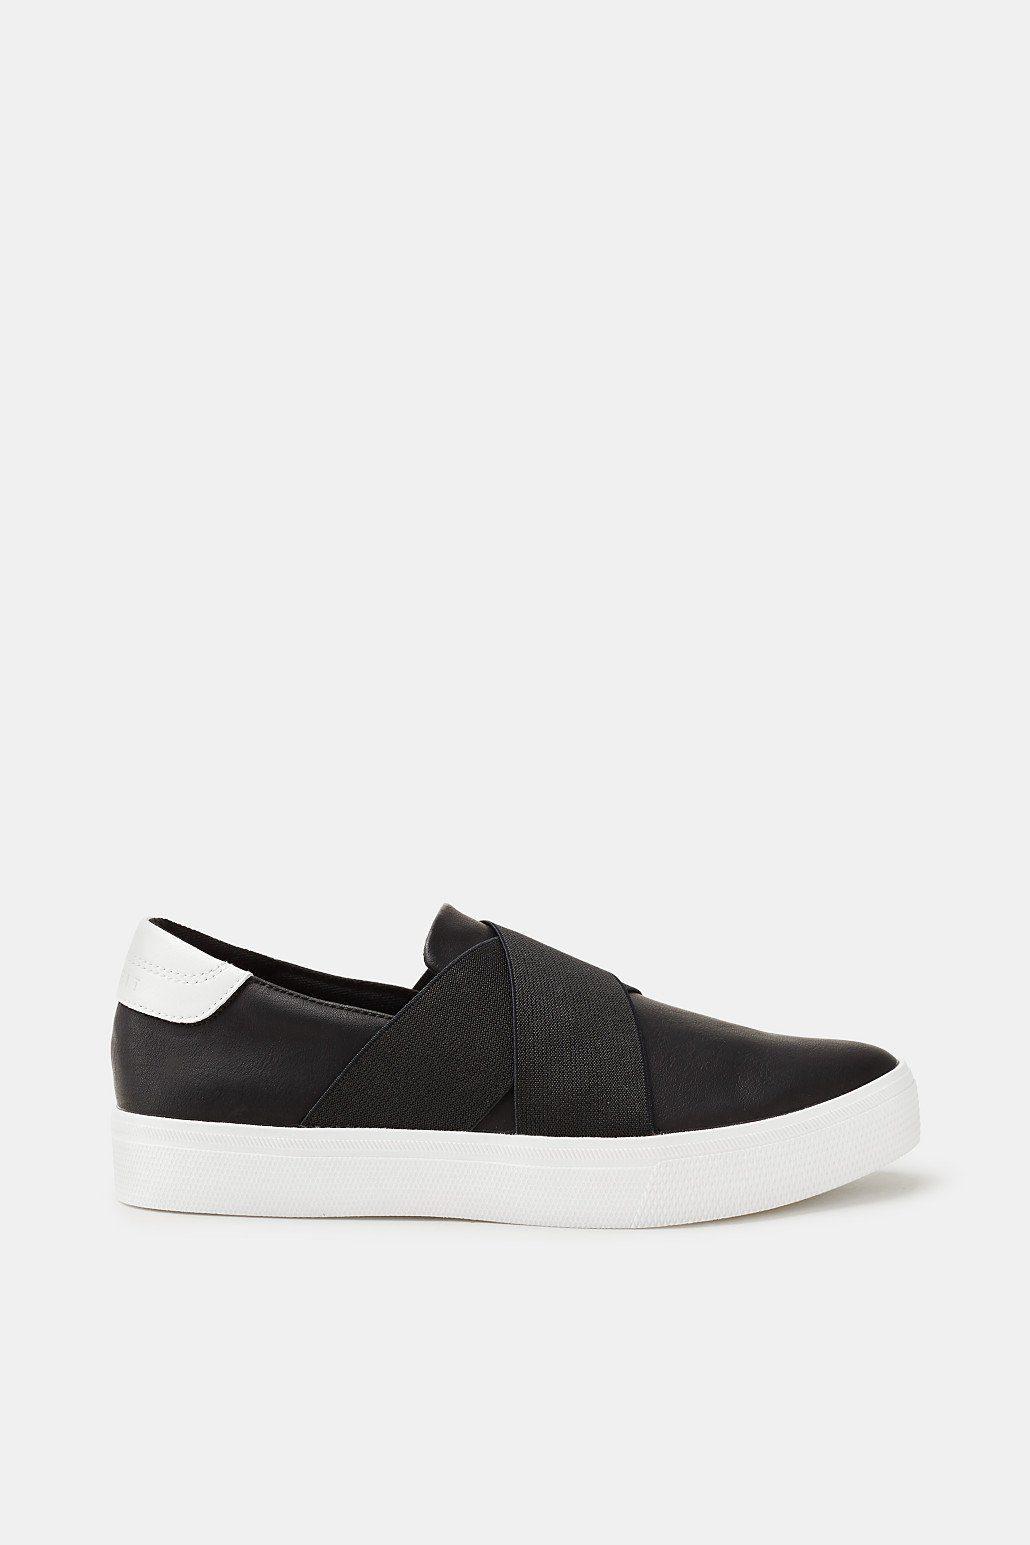 ESPRIT Slip On-Sneaker in Leder-Optik kaufen  BLACK